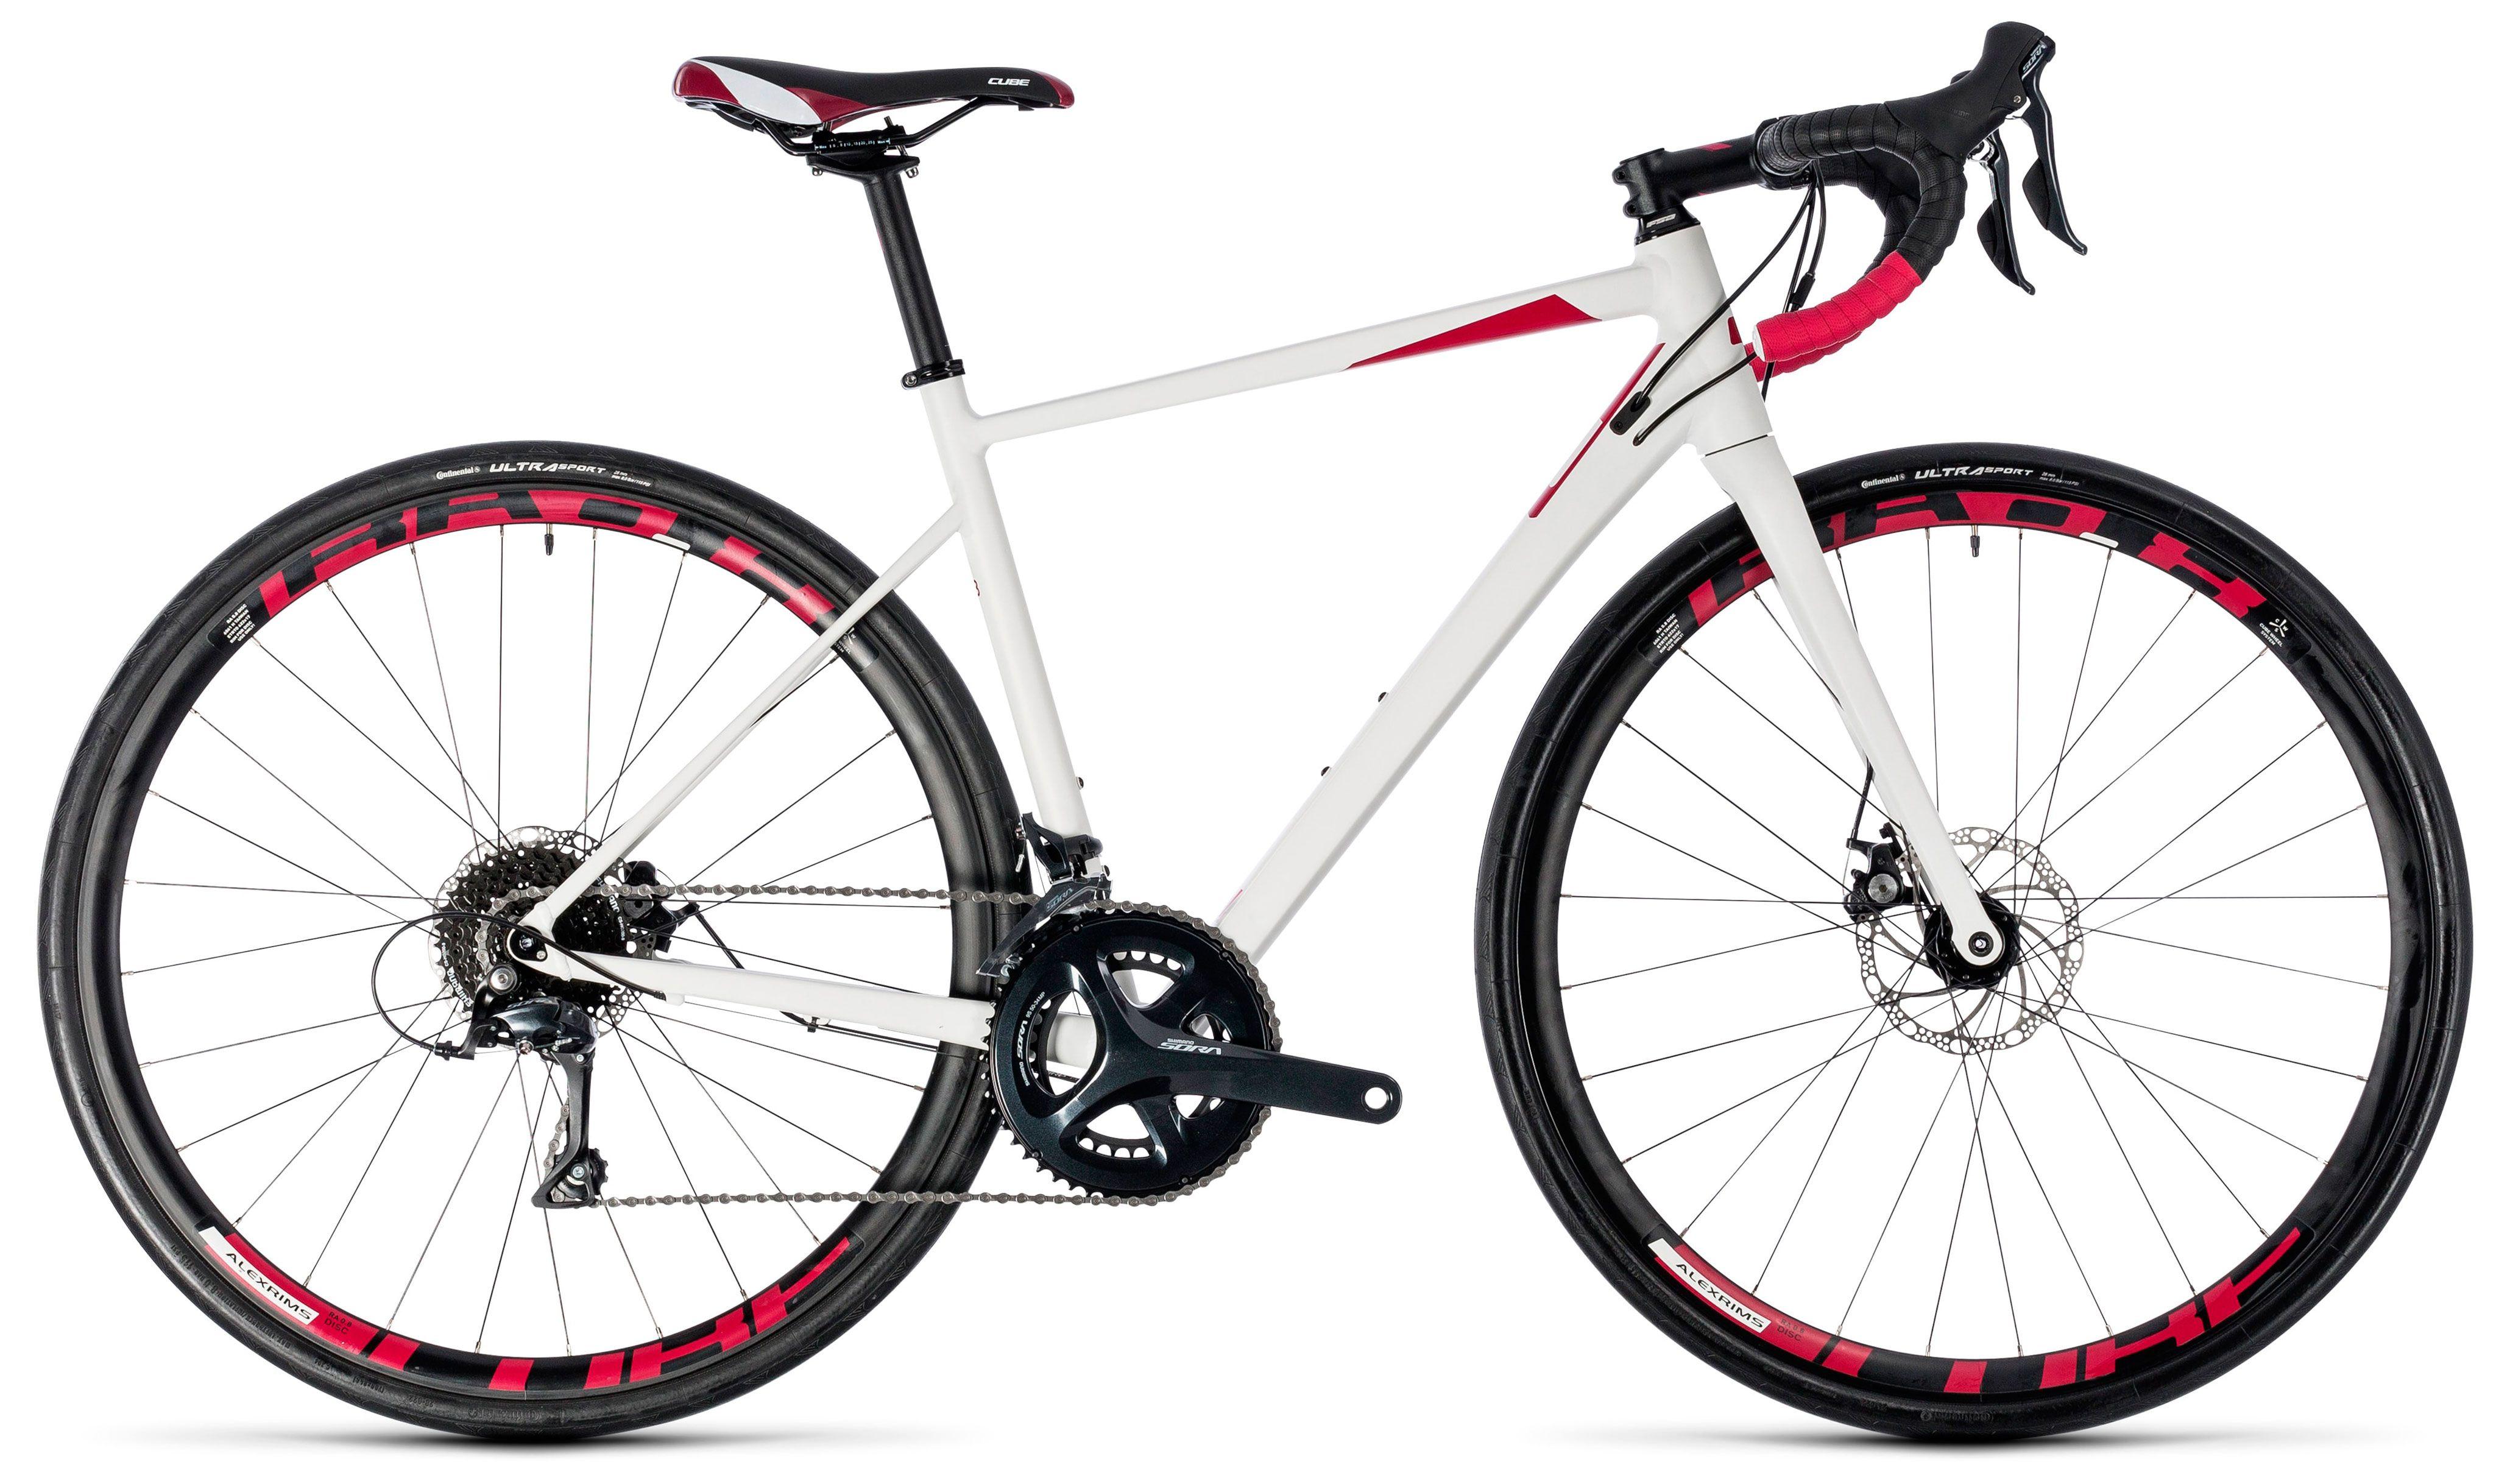 Велосипед Cube Axial WS Pro Disc 2018 велосипед specialized roubaix sl4 pro race 2015